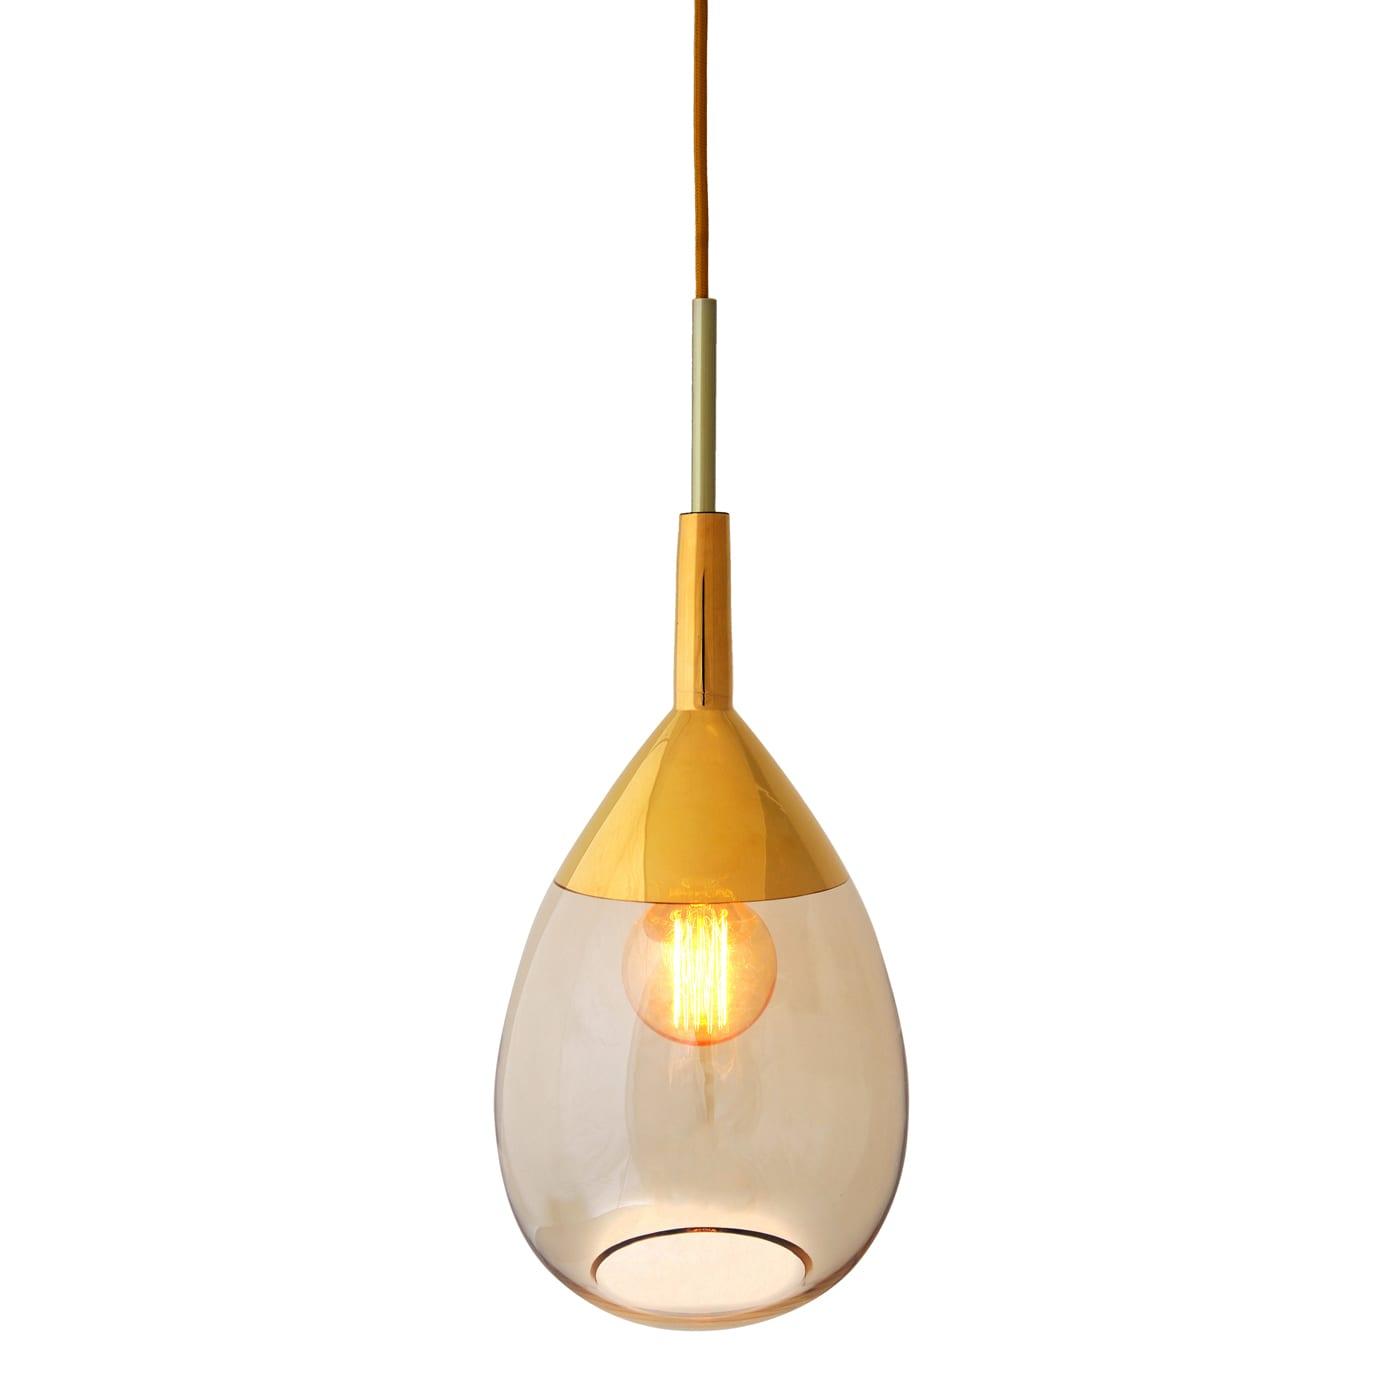 Lute Pendant Lamp, Golden Smoke, 49cmH